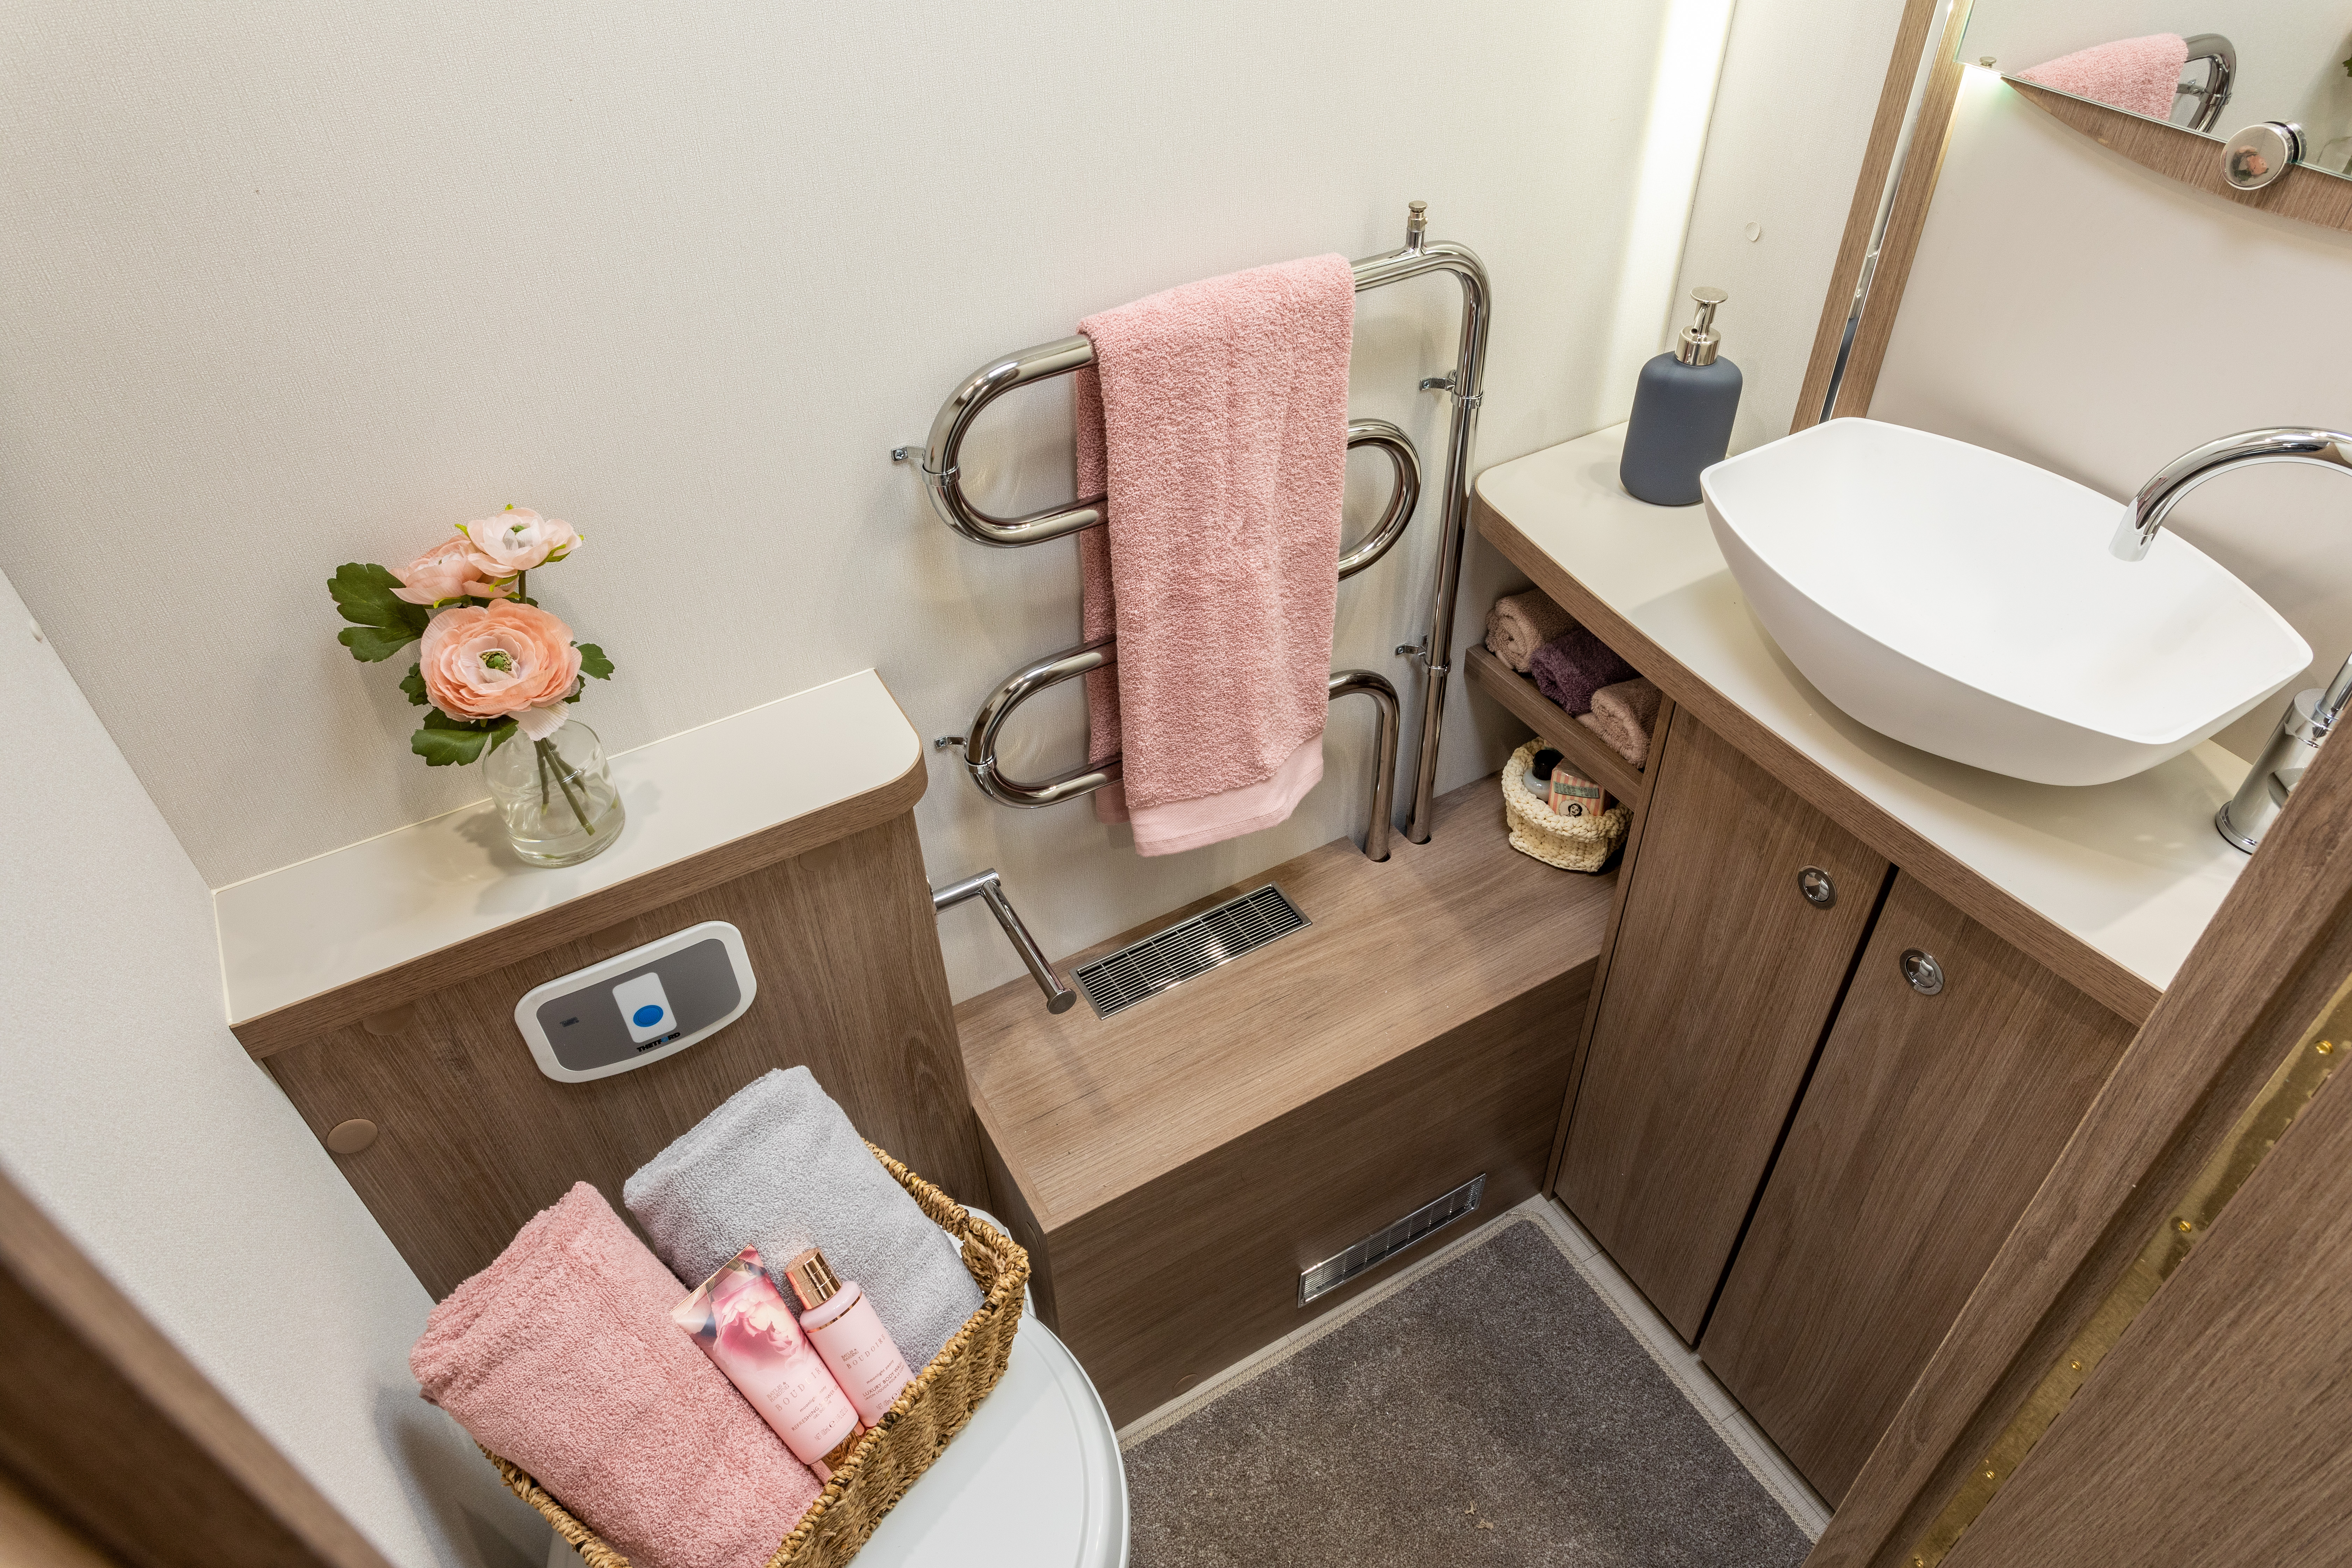 CAPIRO 550 - Washroom